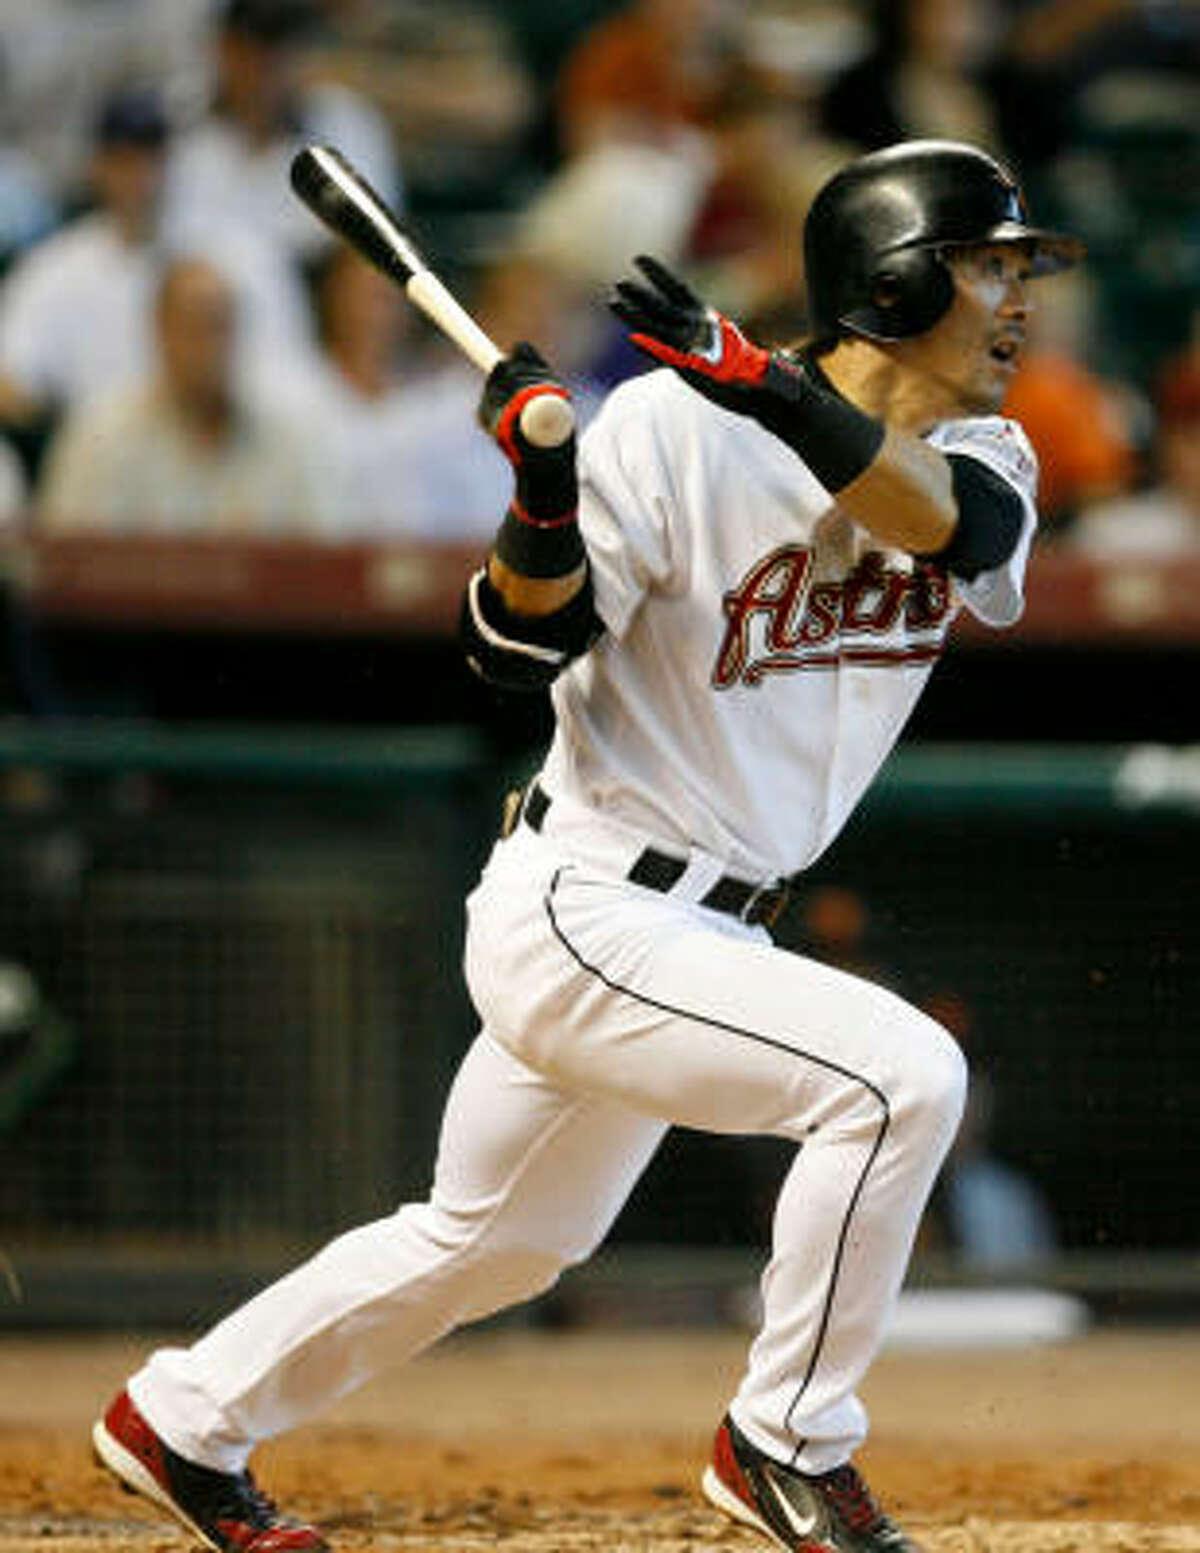 2. Kaz Matsui, 2B 2009 stats: .250 batting average, 9 HRs, 46 RBI, .302 on-base percentage